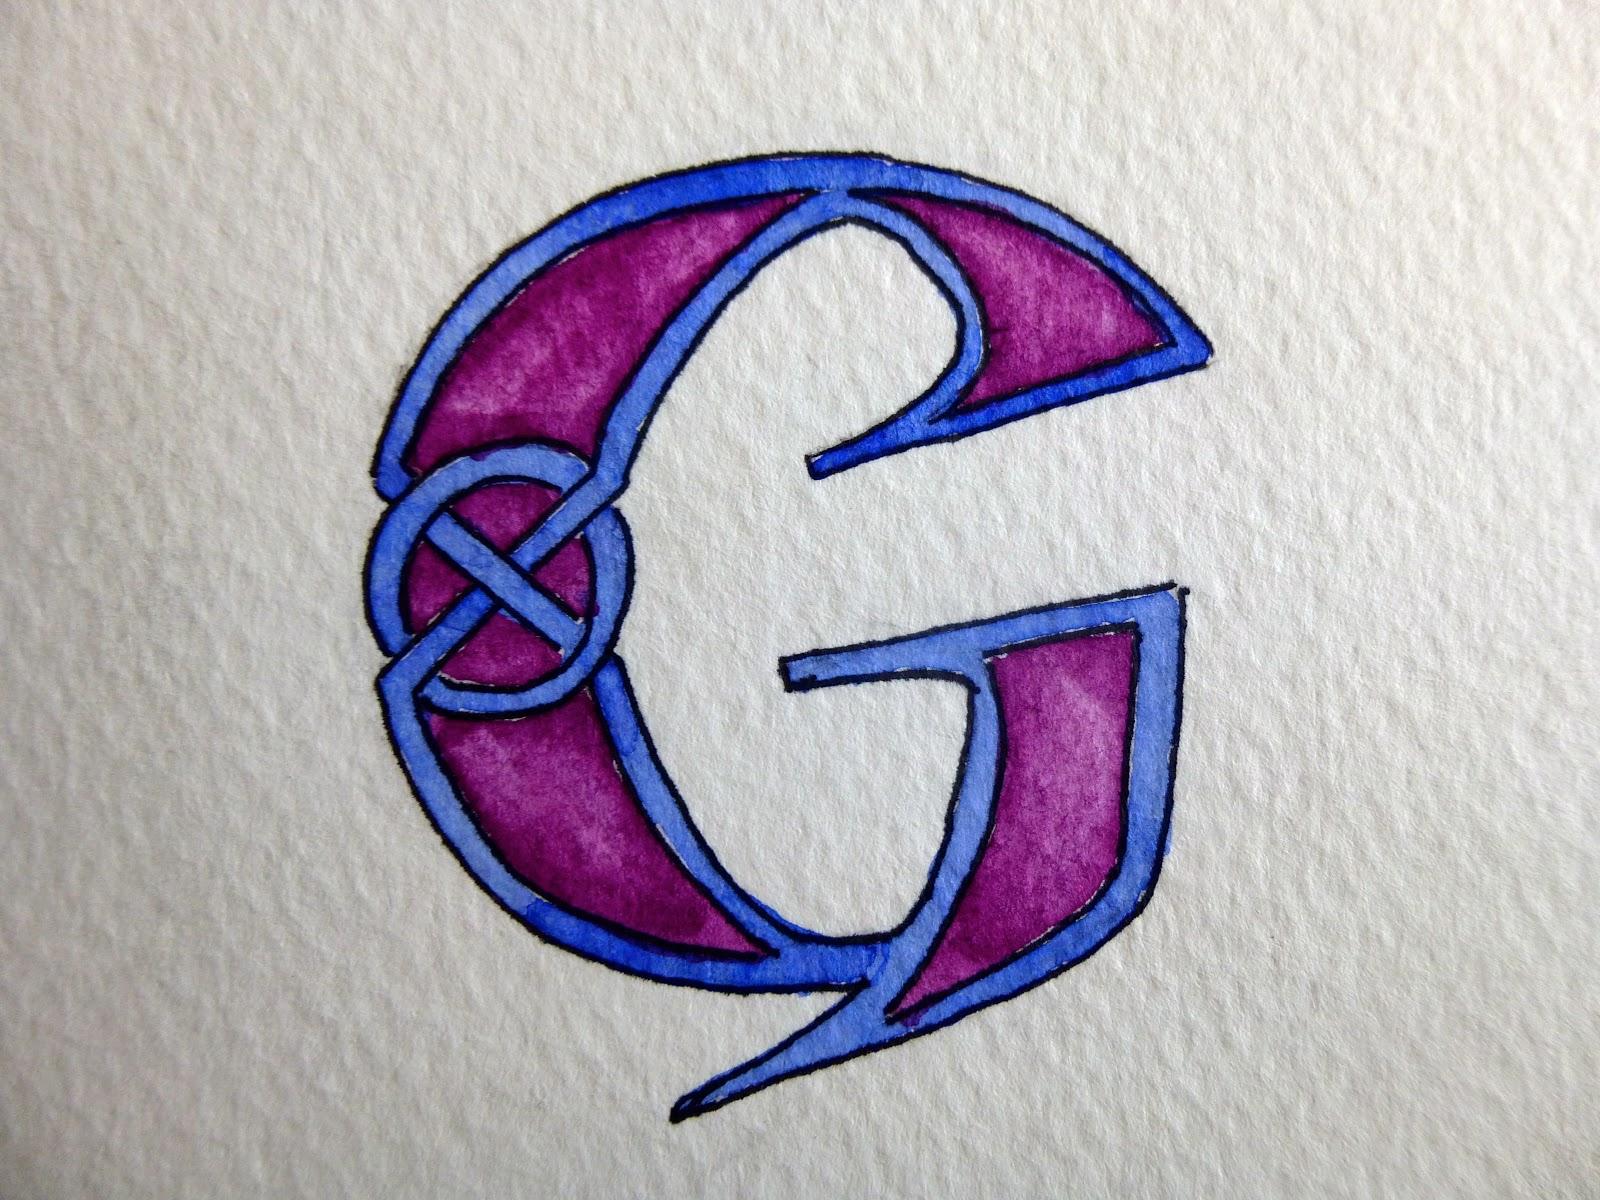 صور صور حرف g , بوستات عليها حرف ال g